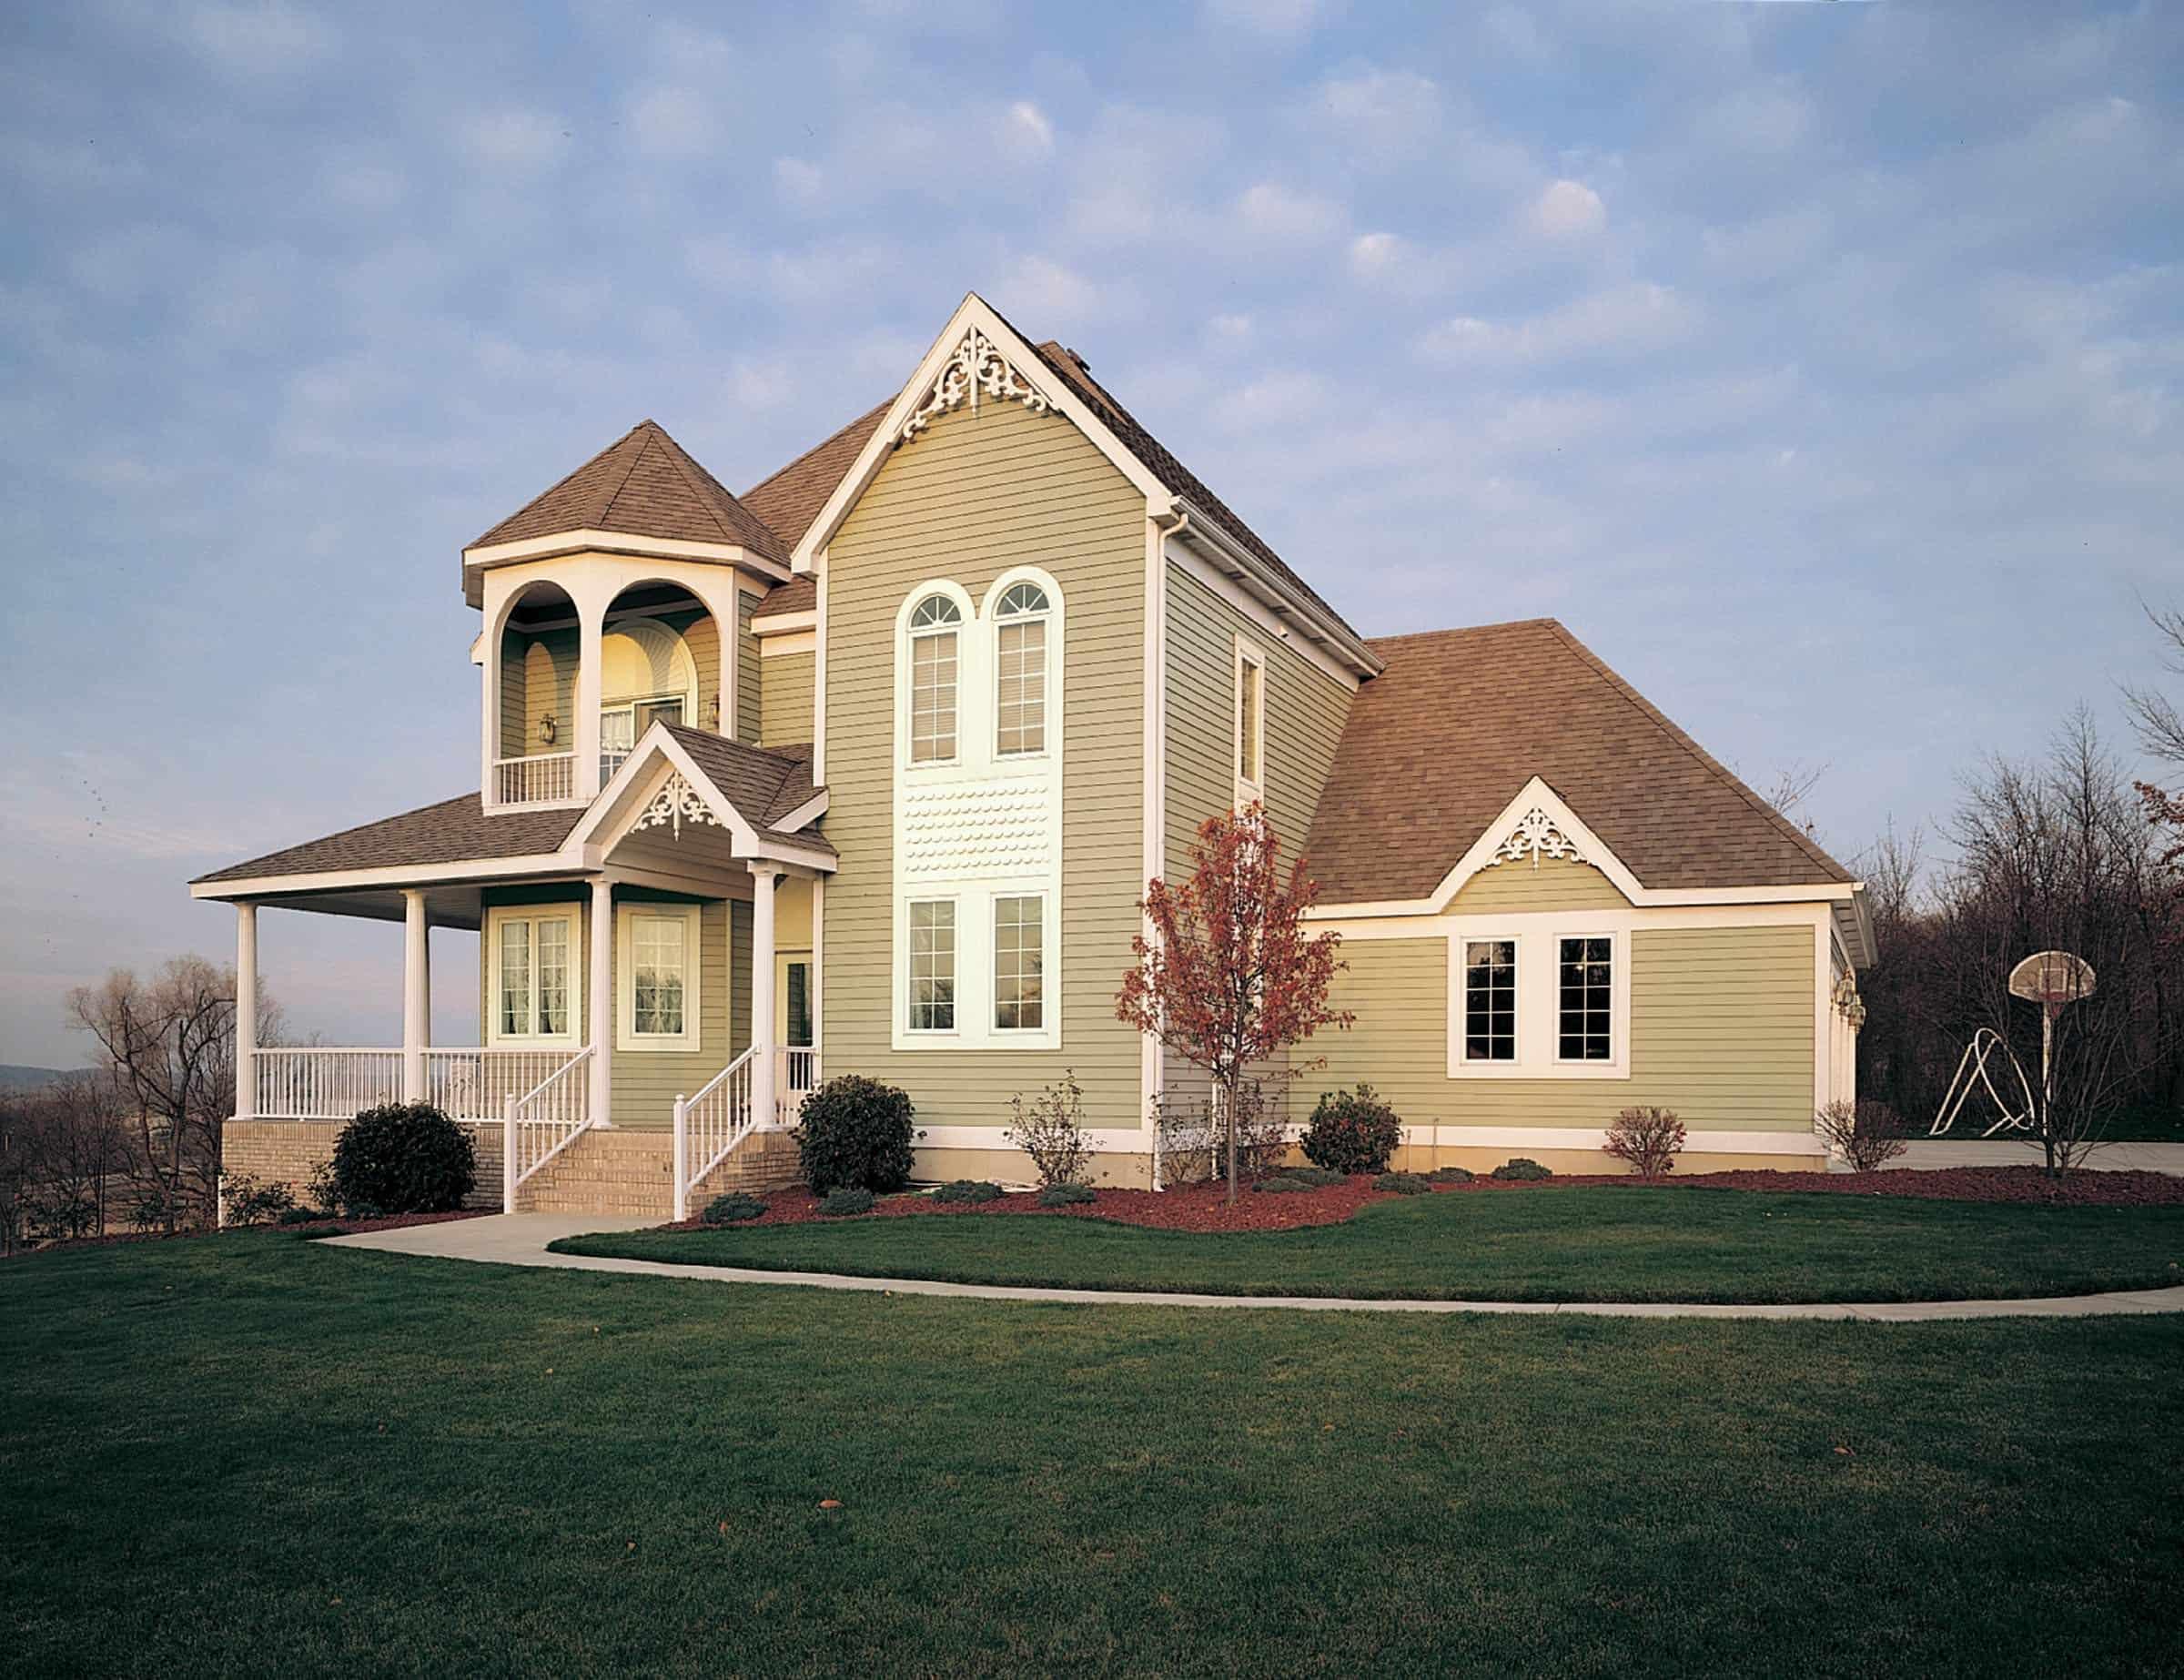 Exterior: Mastic Home Exteriors And Siding ProductsA.B. Edward